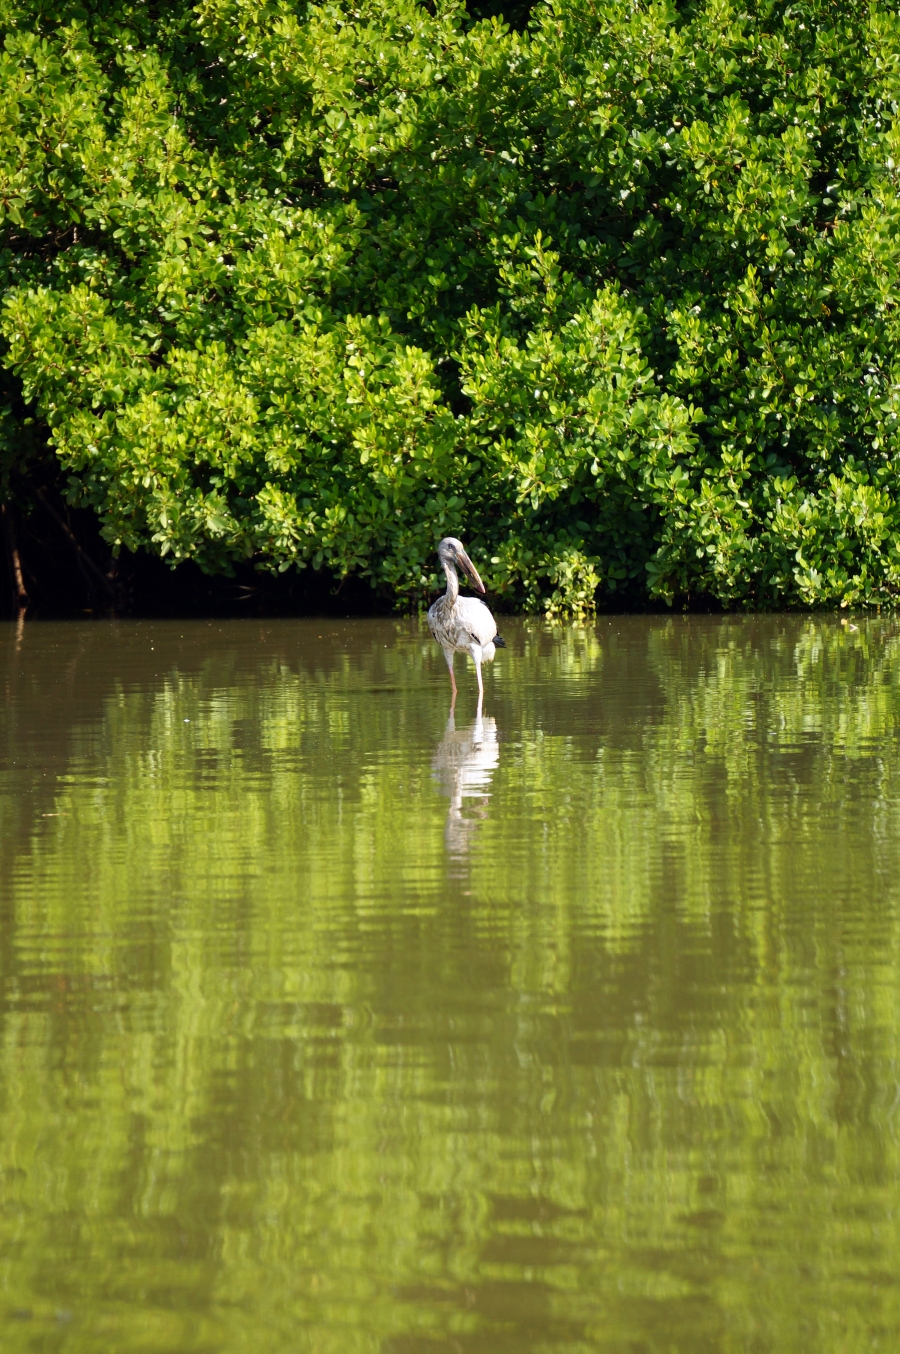 tangalle-lagoon-wildlife-01